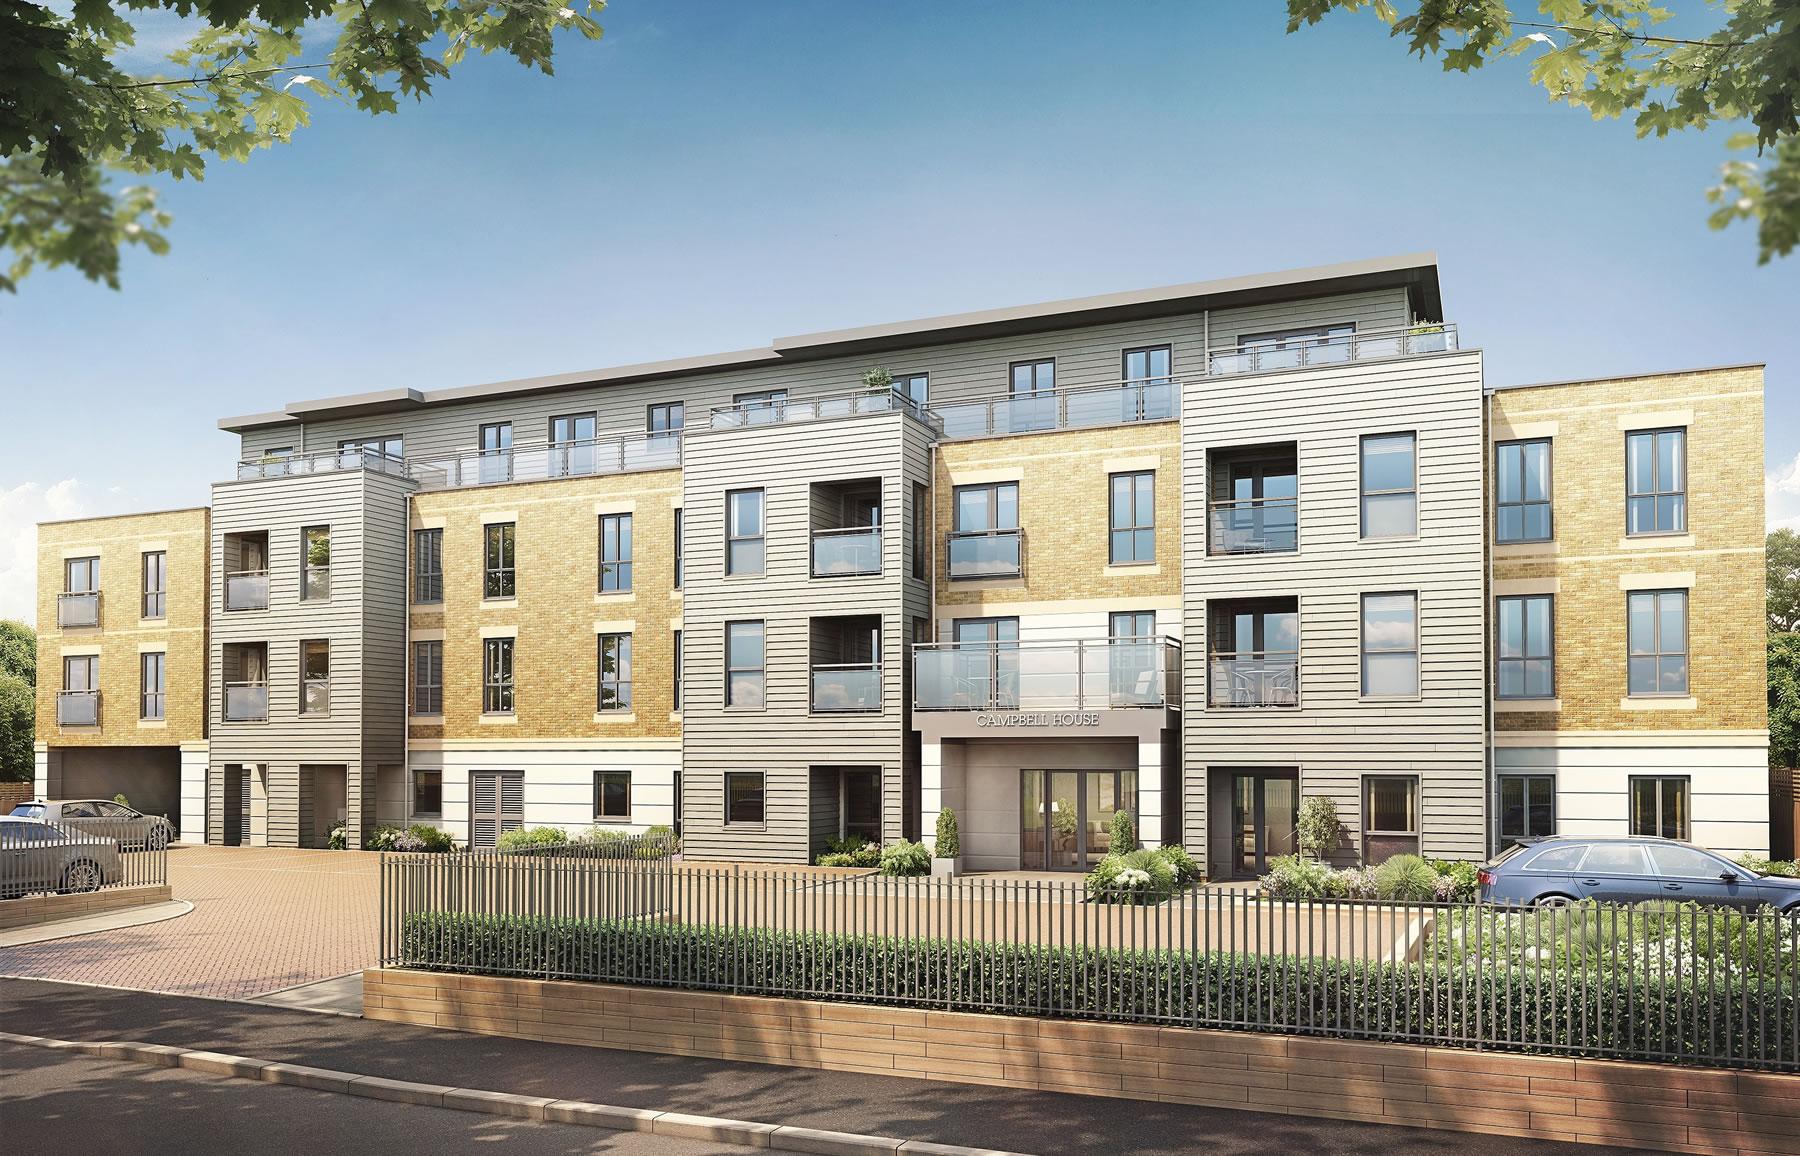 Weybridge Surrey Retirement Properties - McCarthy and Stone Development